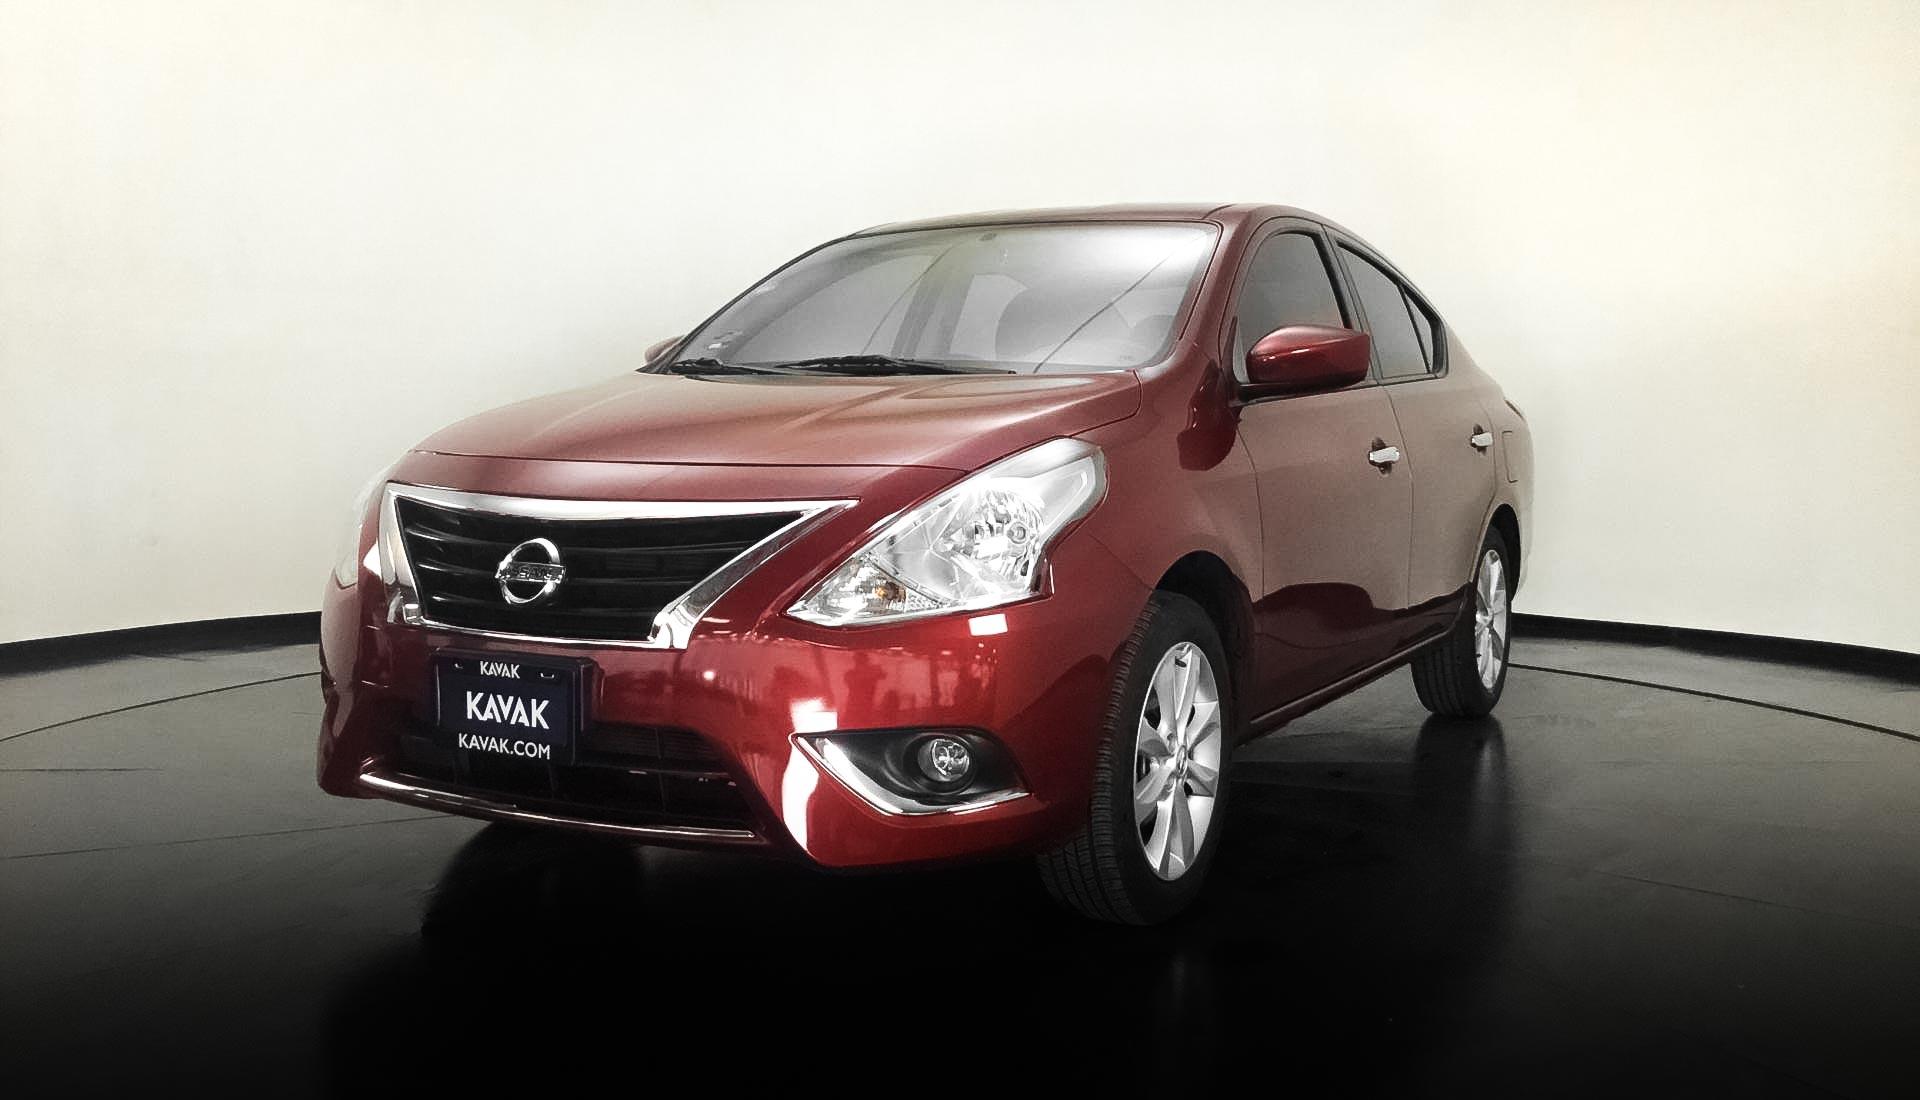 Nissan Versa 2018 2435 16139 Km Precio 194999